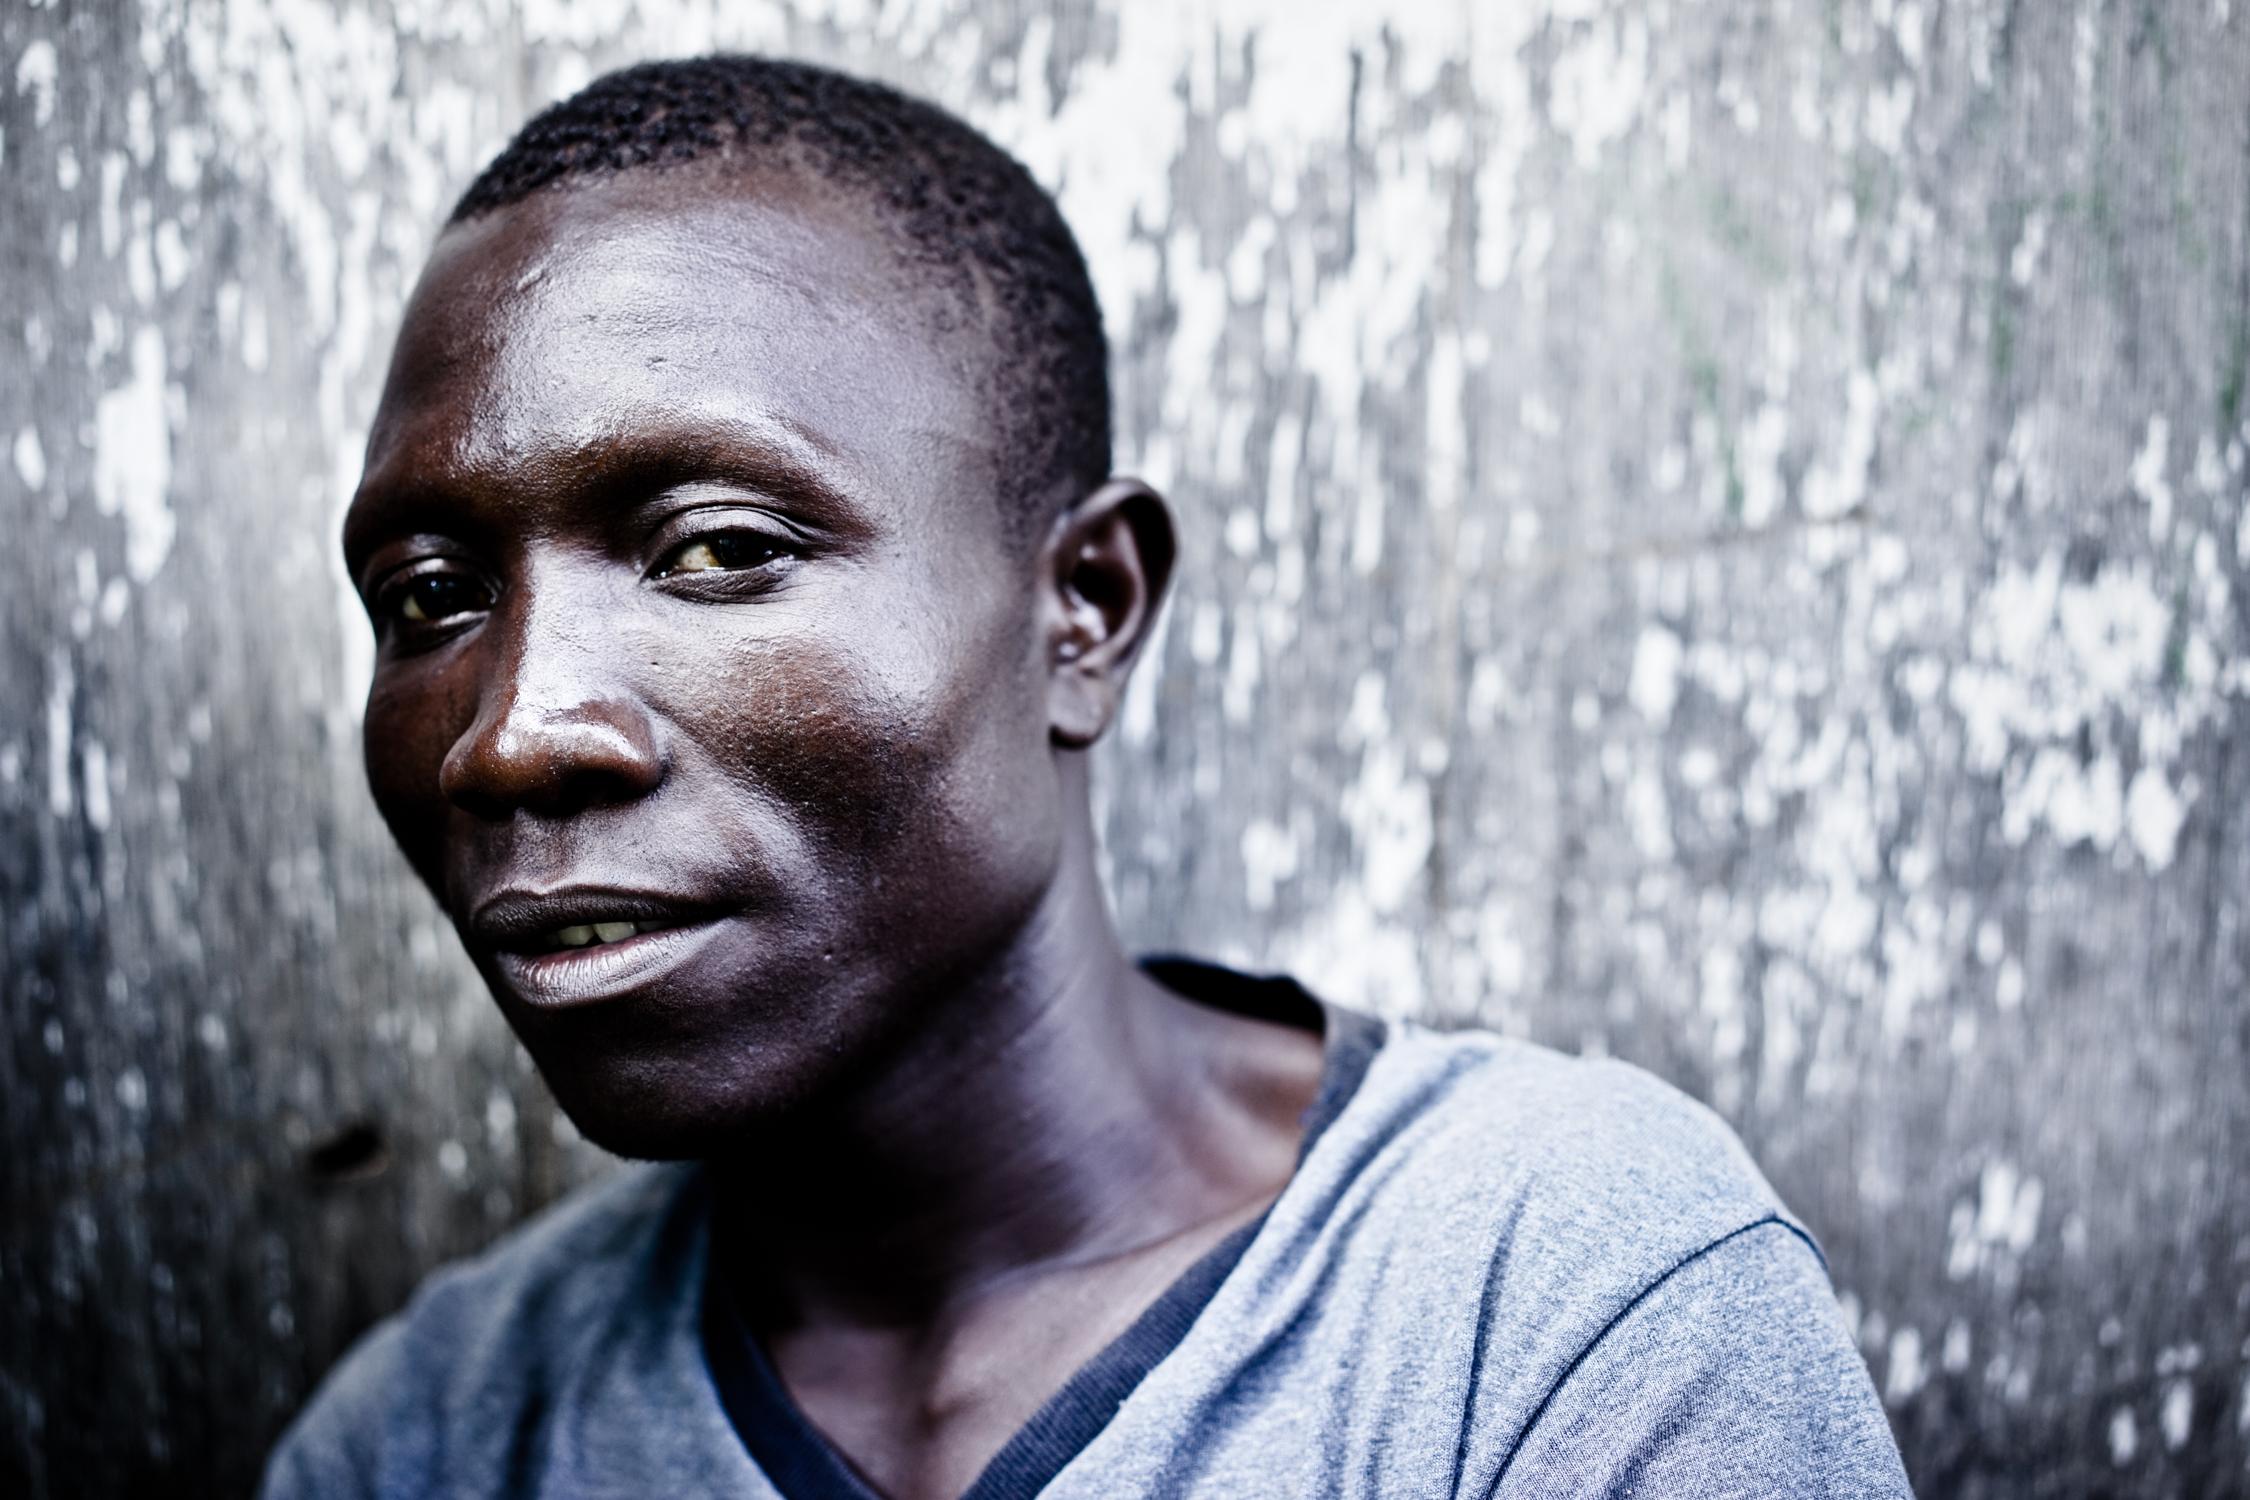 sony a7r camera and fe 55 lens review haiti